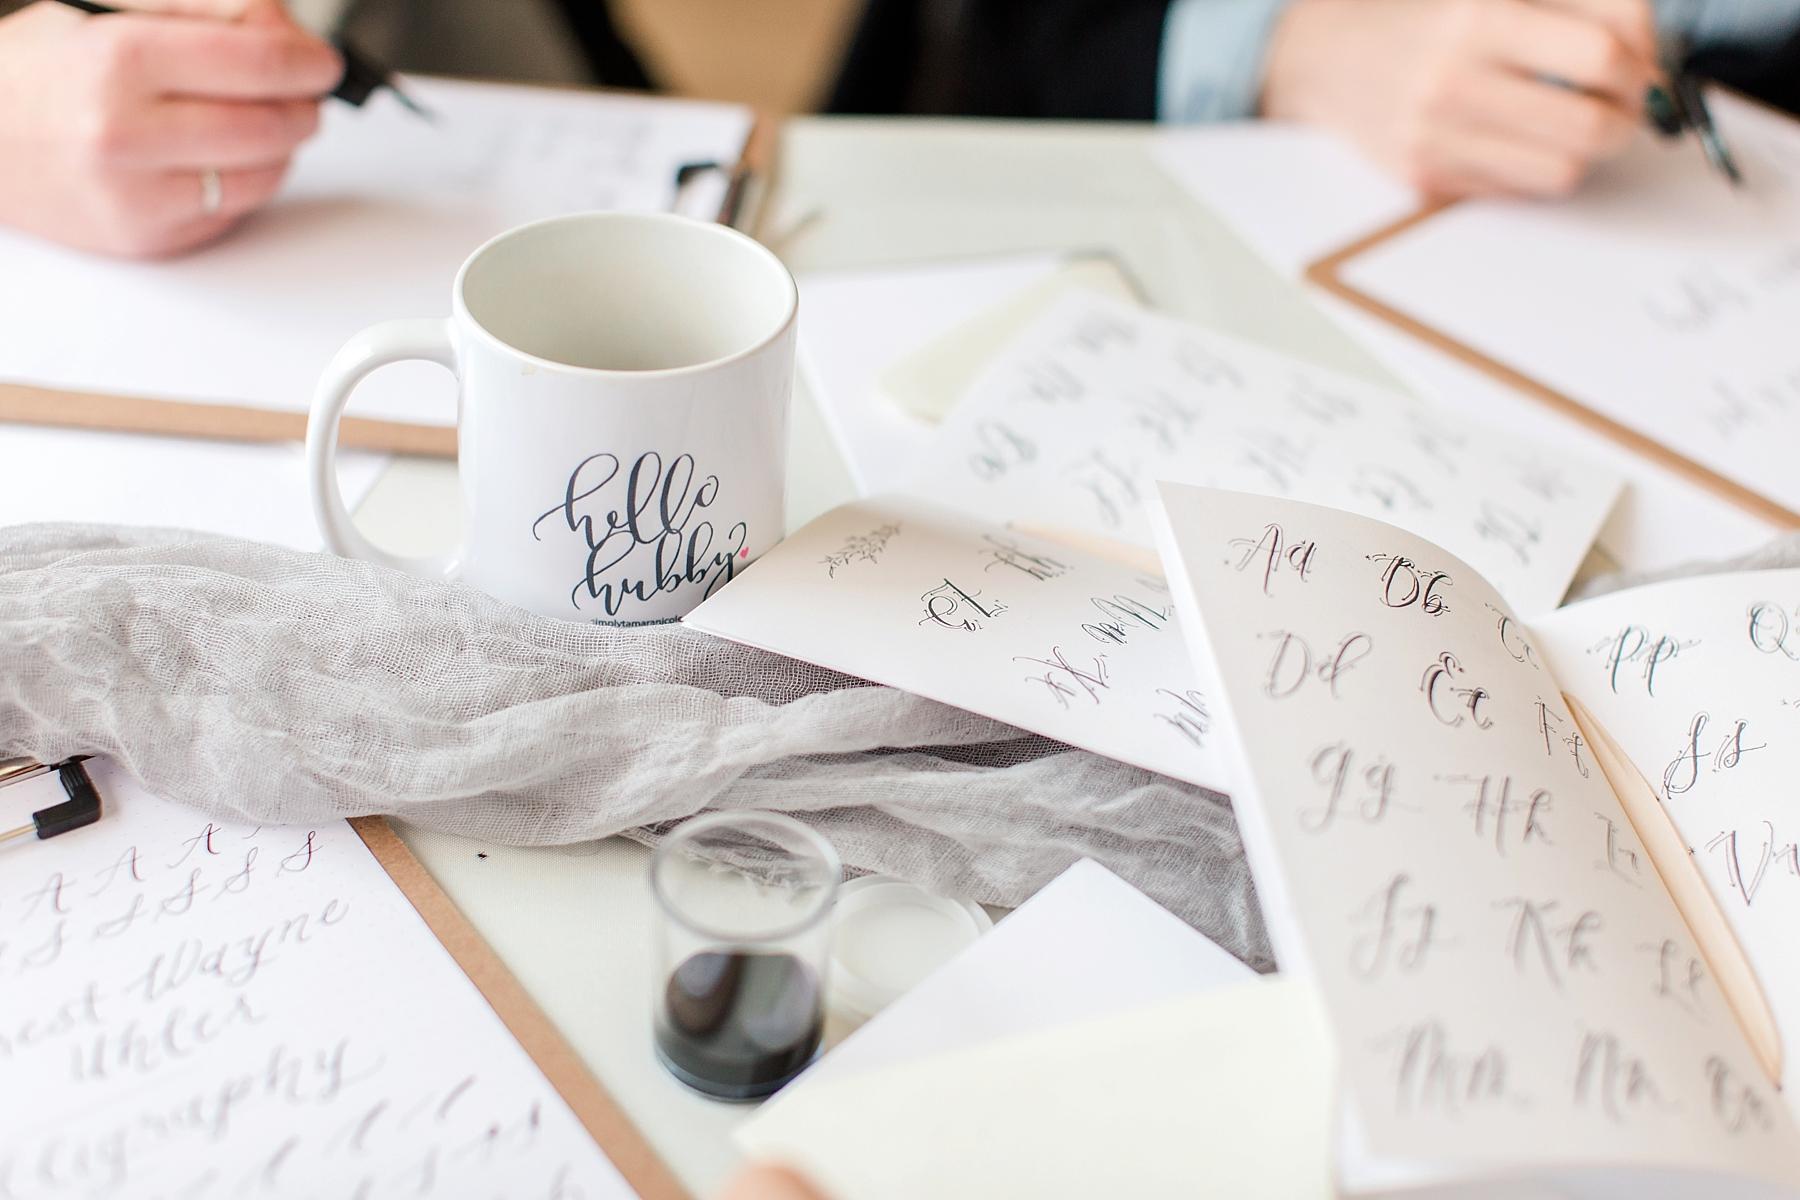 seattle-calligraphy-workshop_0005.jpg